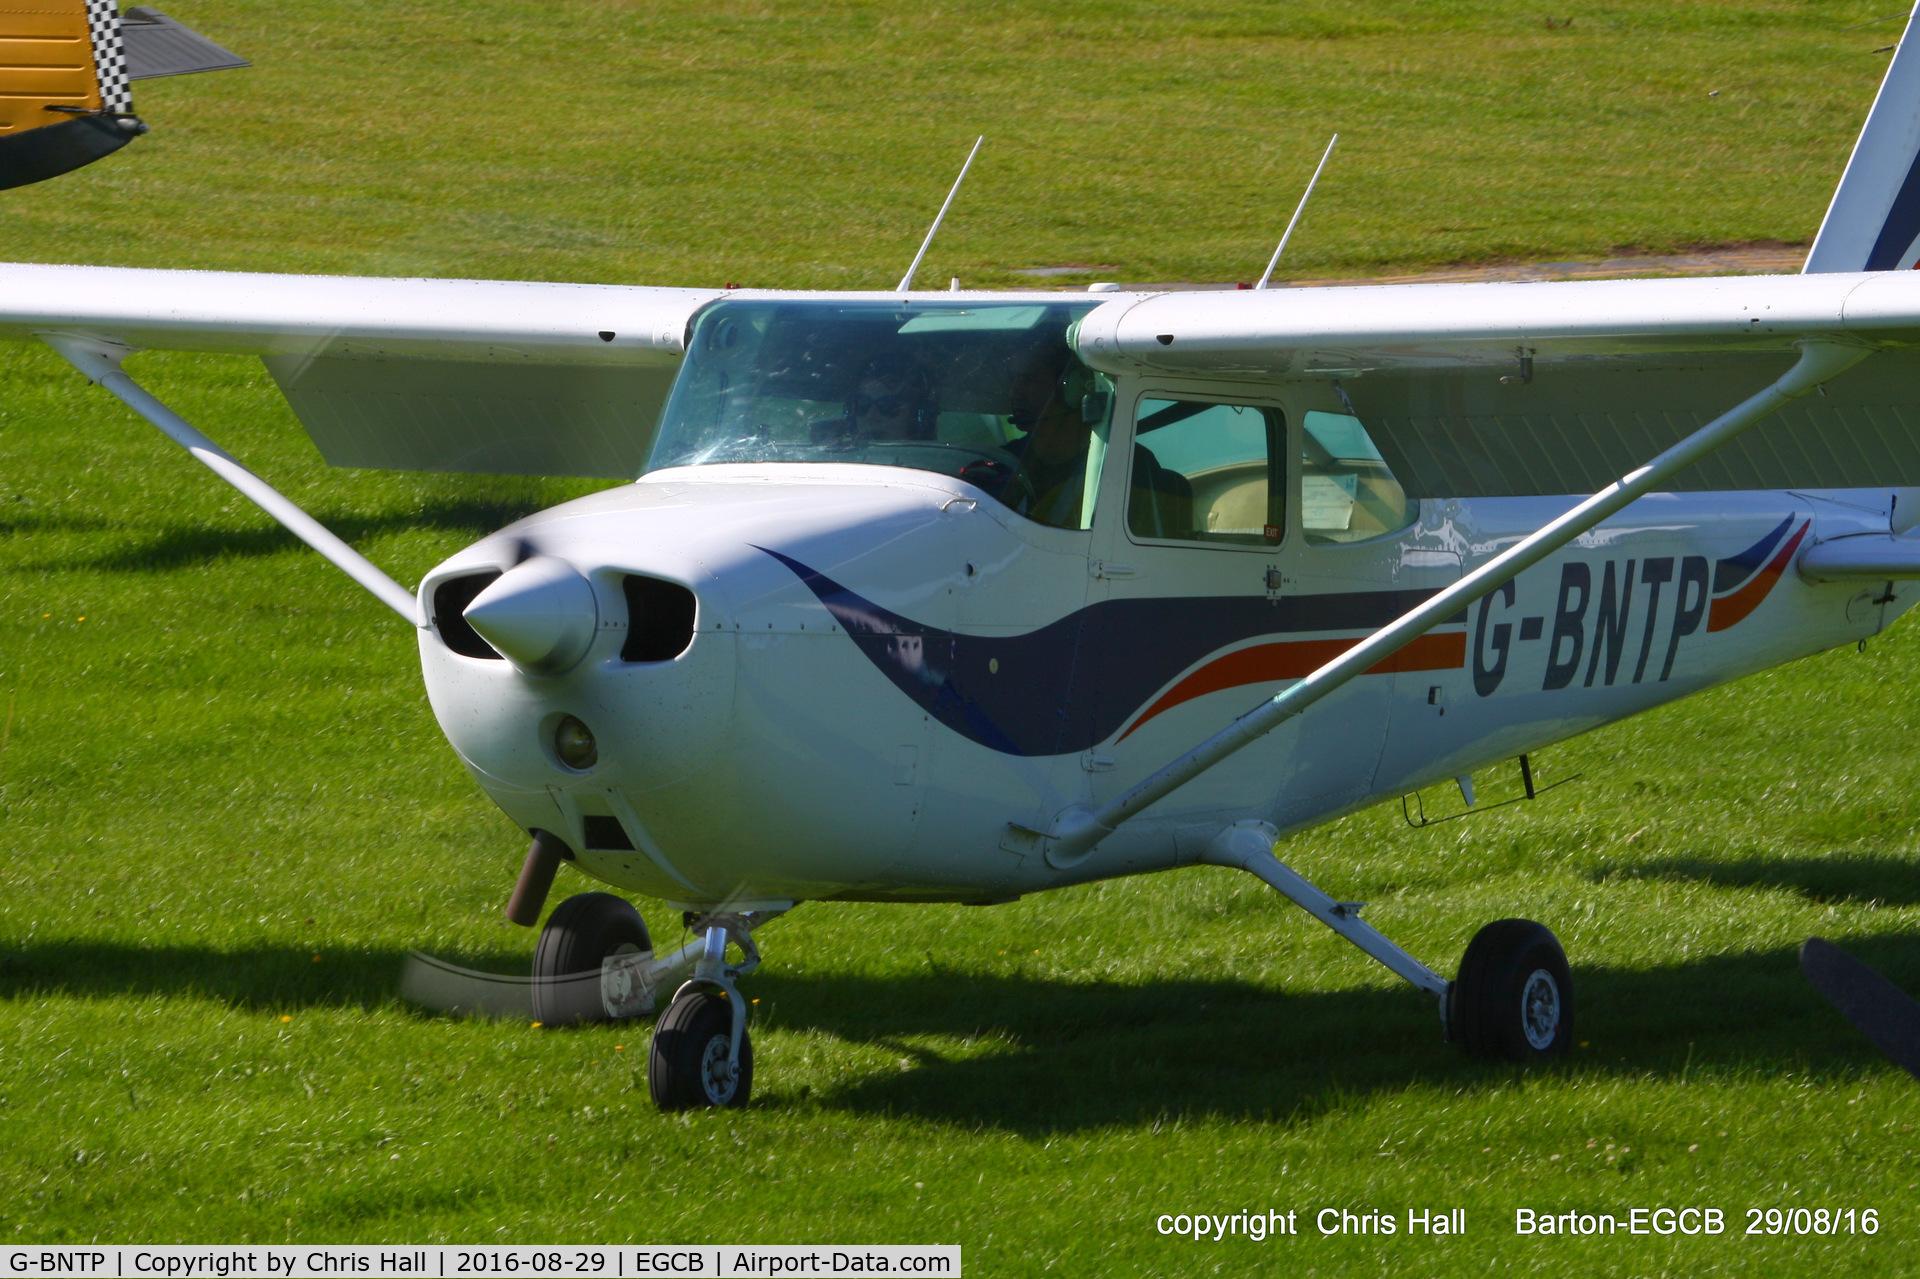 G-BNTP, 1978 Cessna 172N Skyhawk C/N 172-72030, at Barton